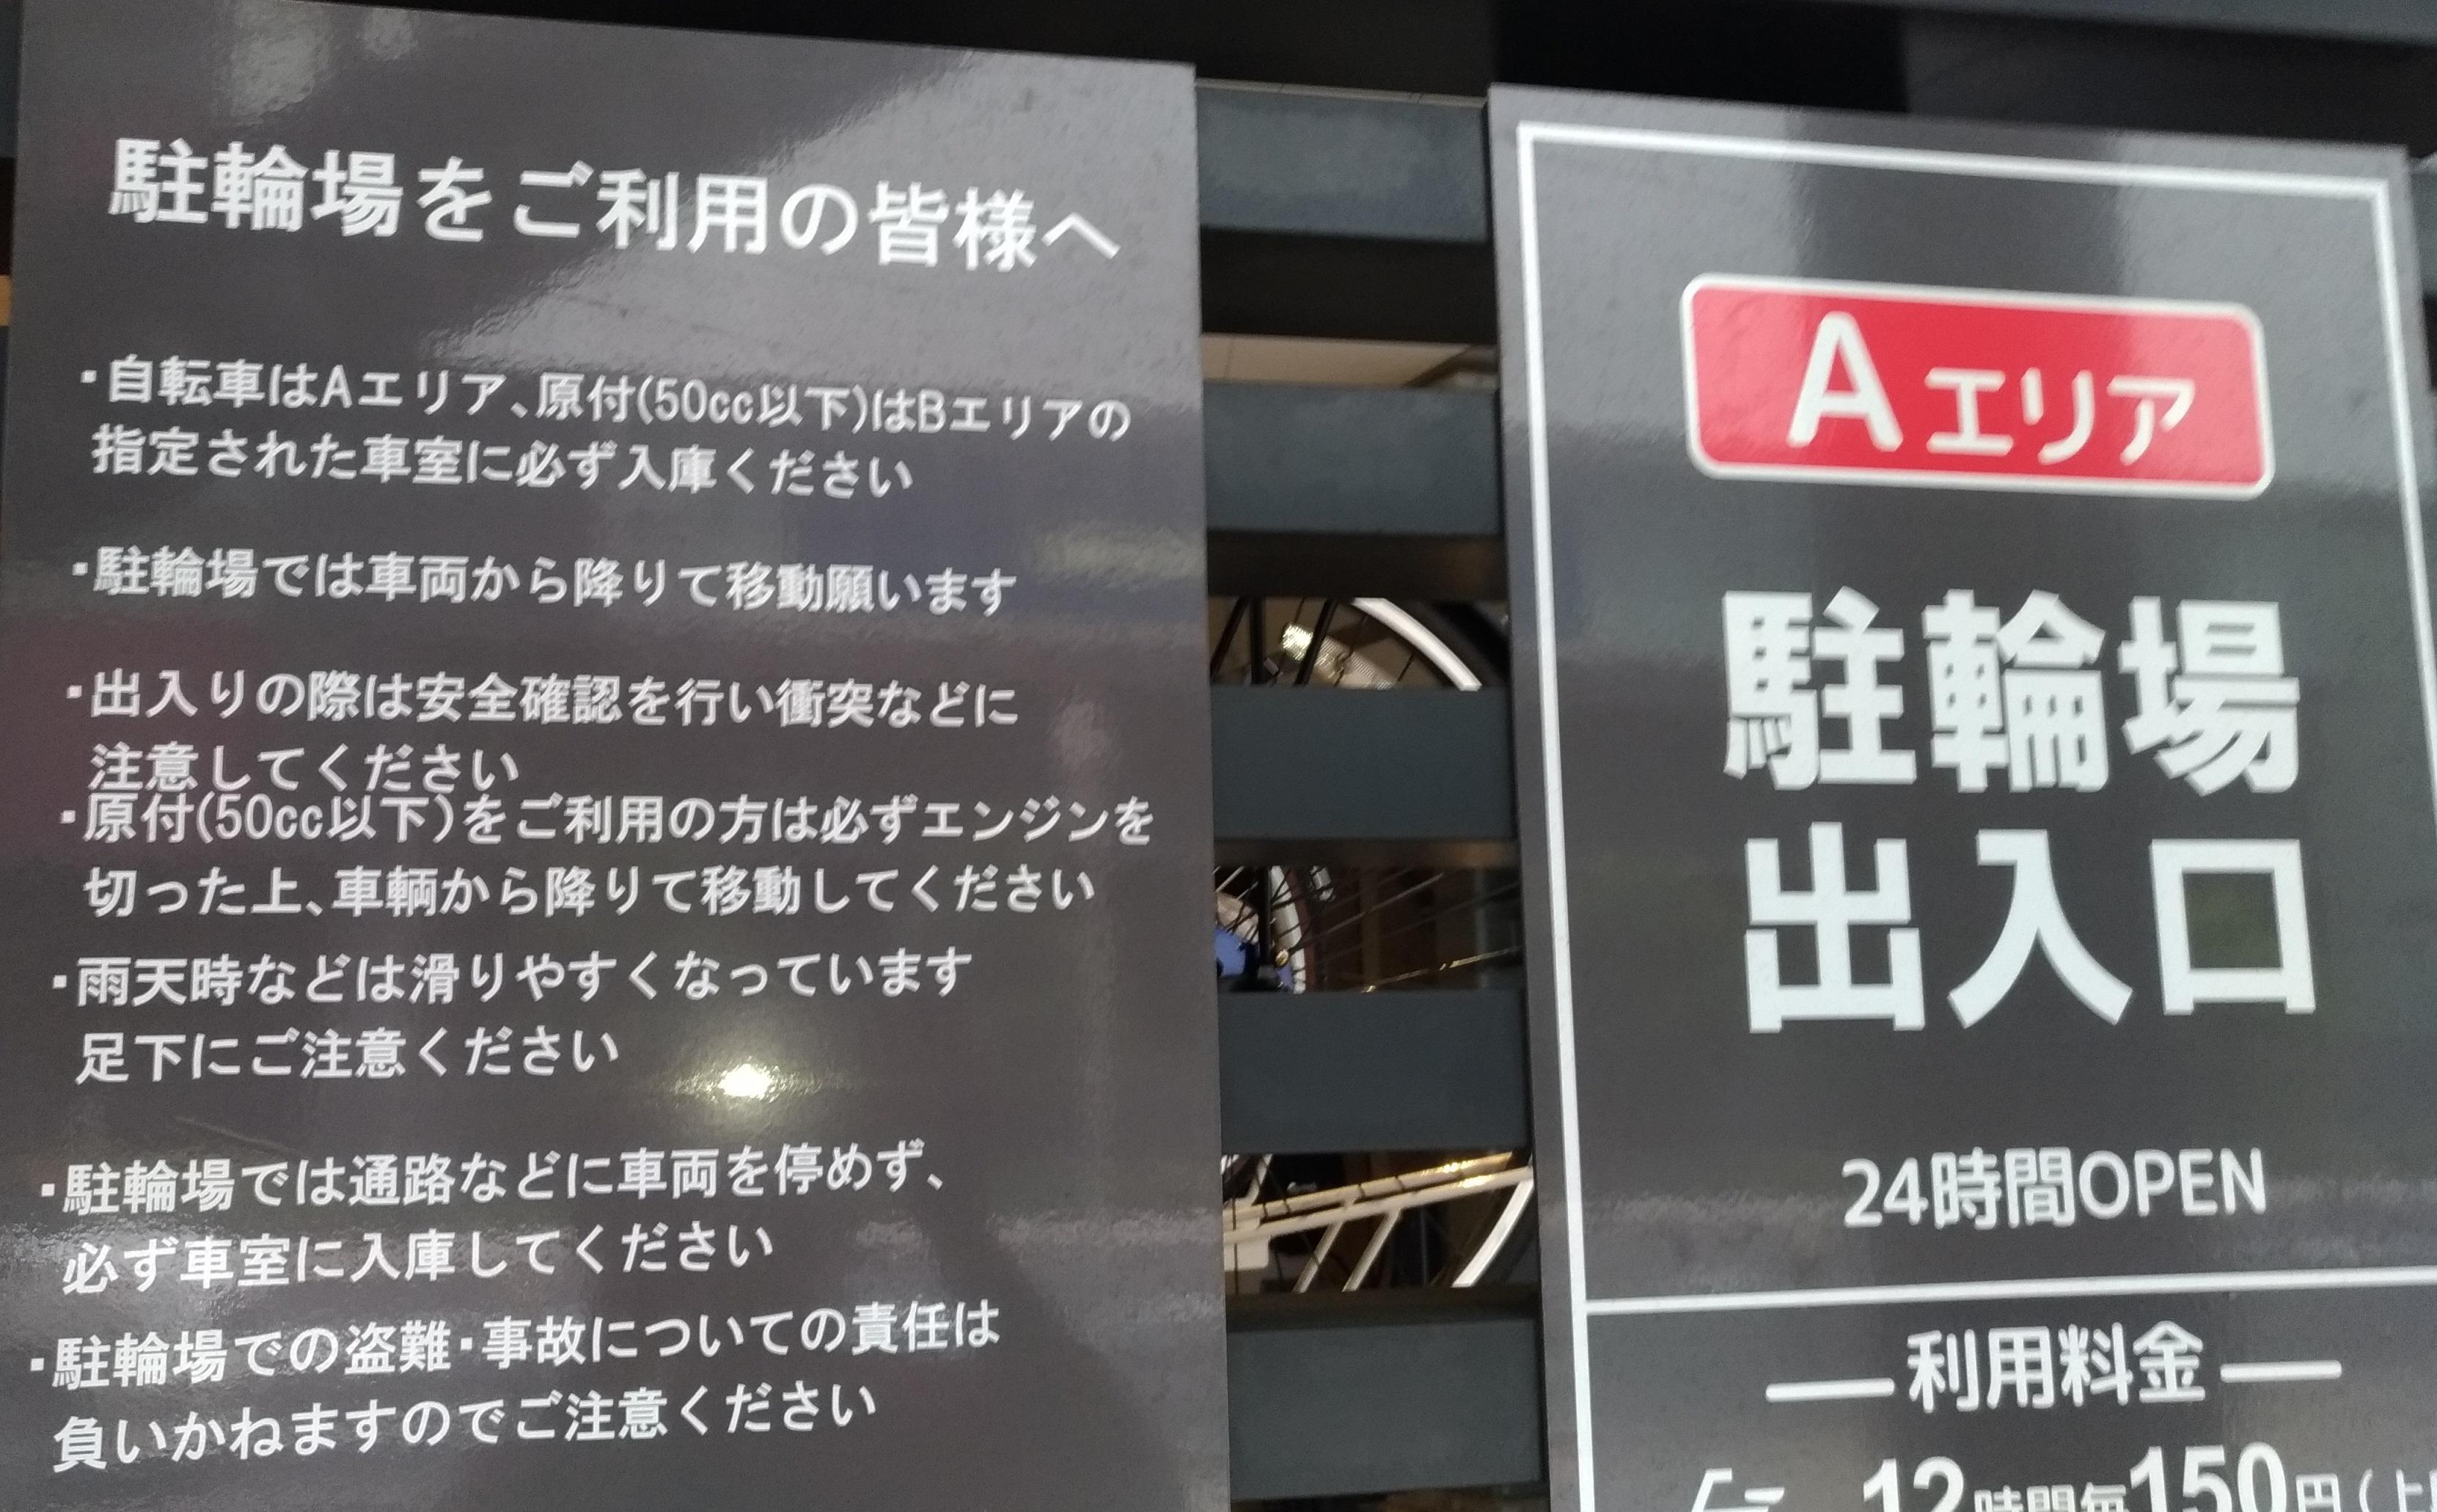 yodobashi_umeda_cycle_ryokin_5.jpg